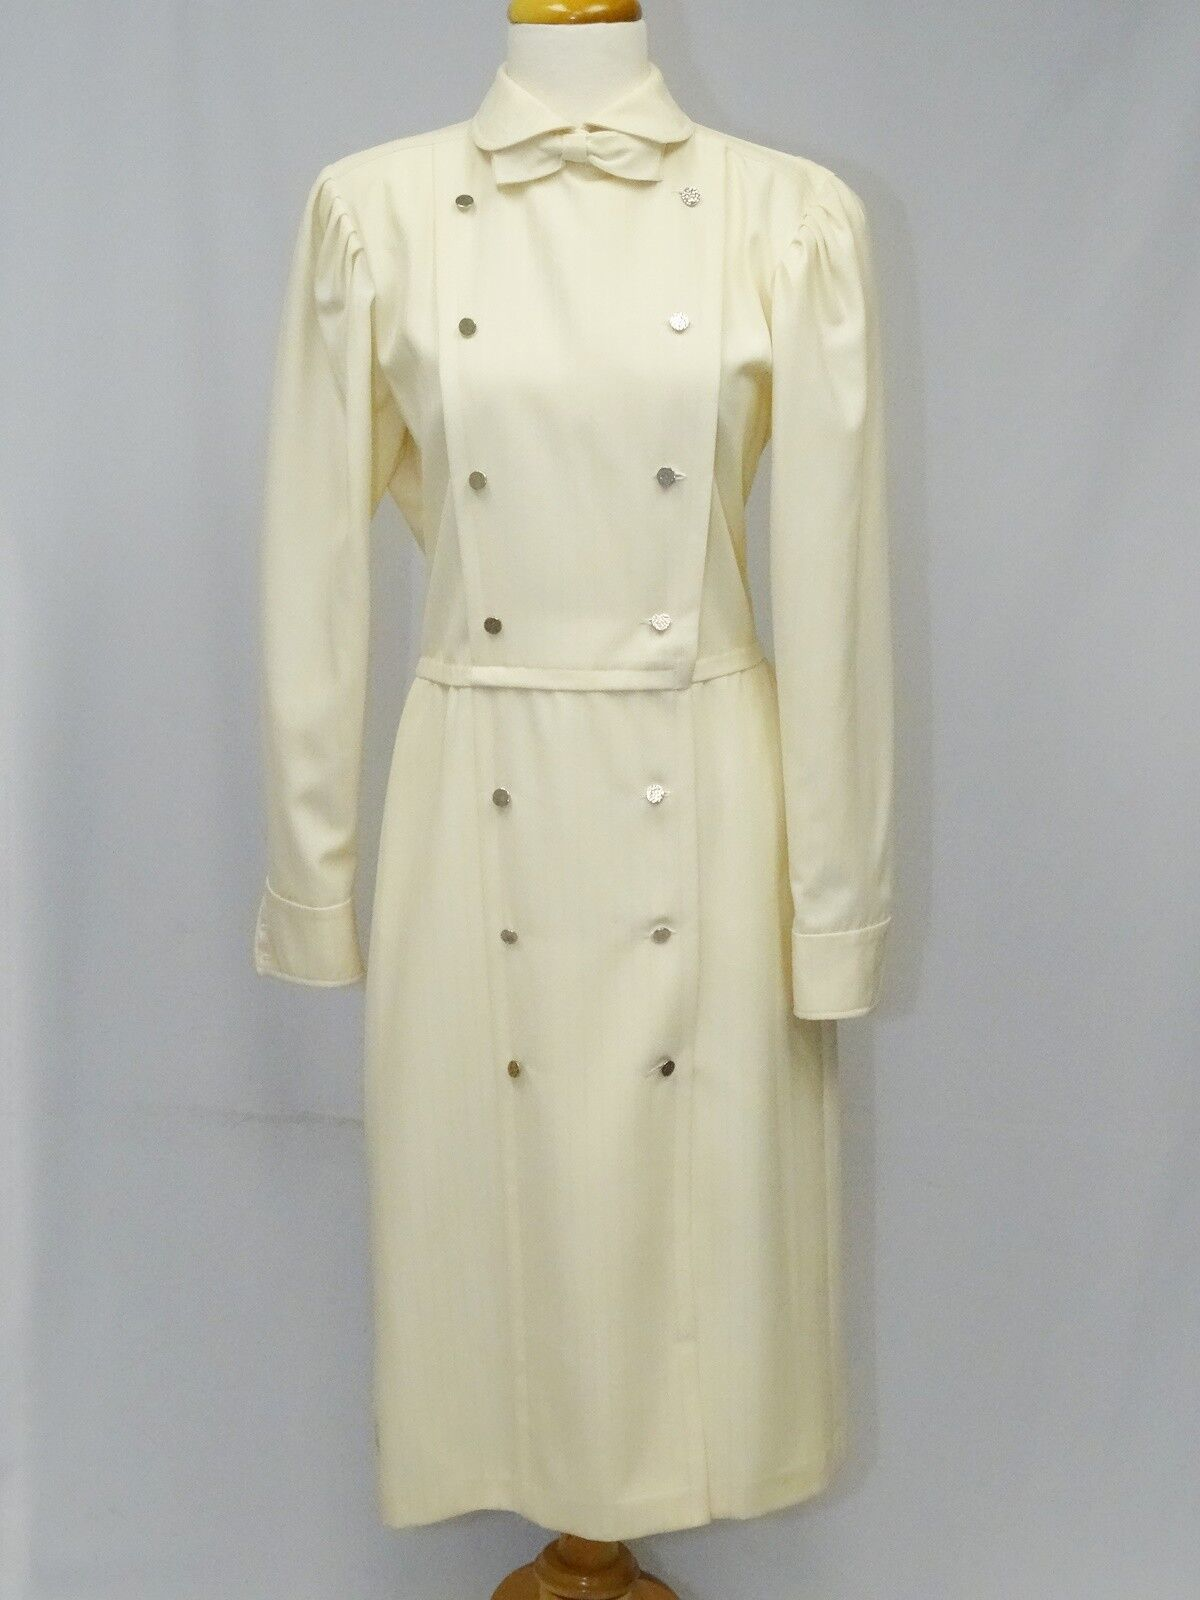 VINTAGE EMANUEL UNGARO PARALLELE IVORY DRESS COAT WITH BOW  sz 12